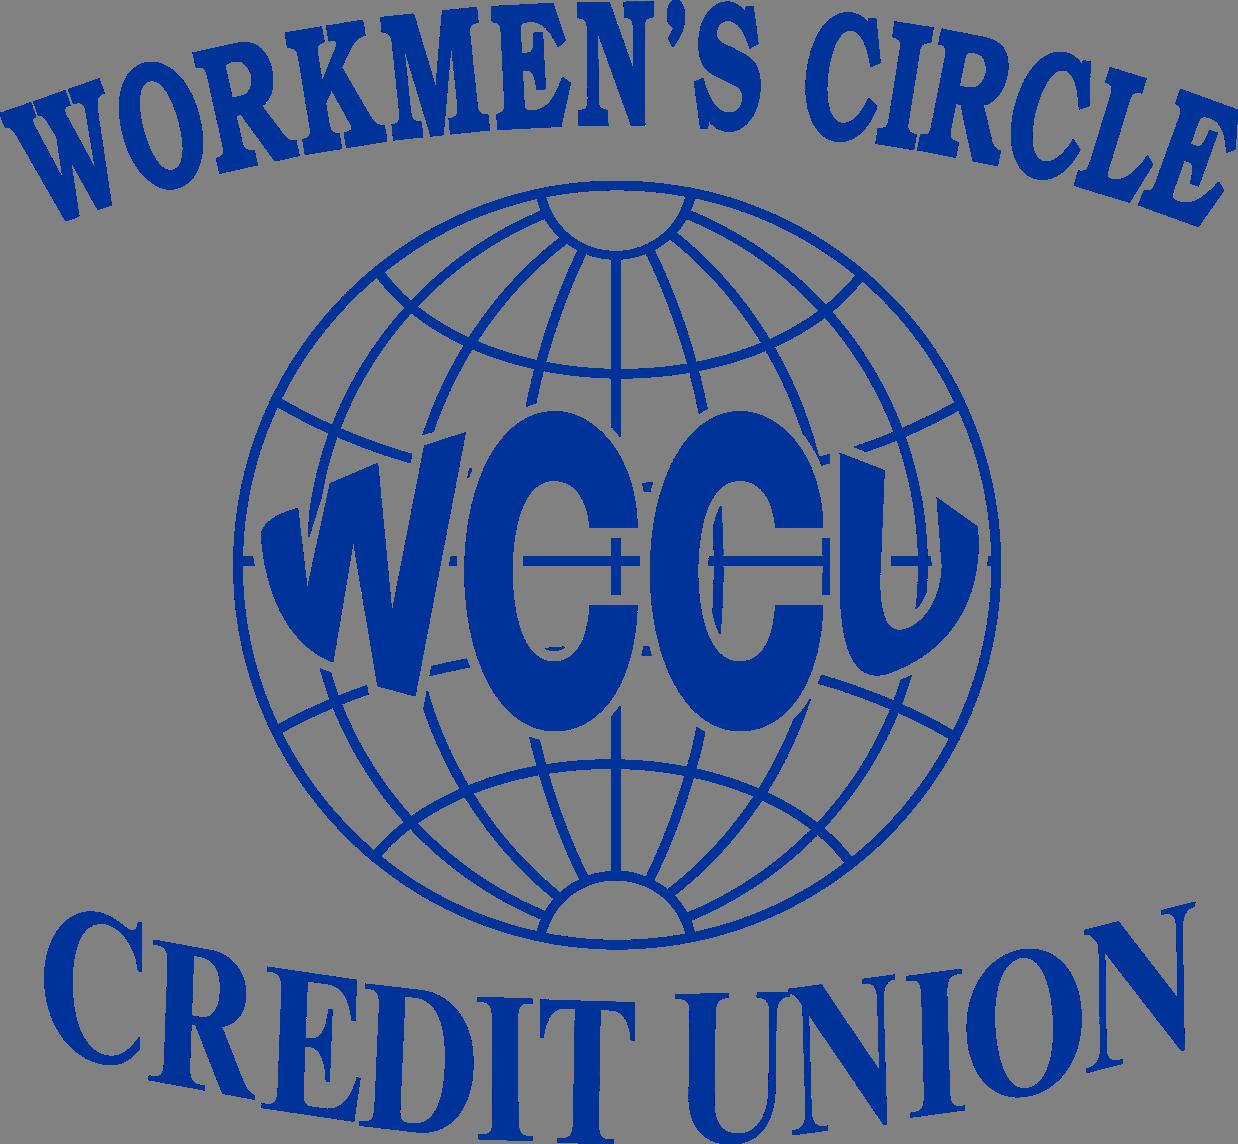 Workmens Circle Credit Union logo